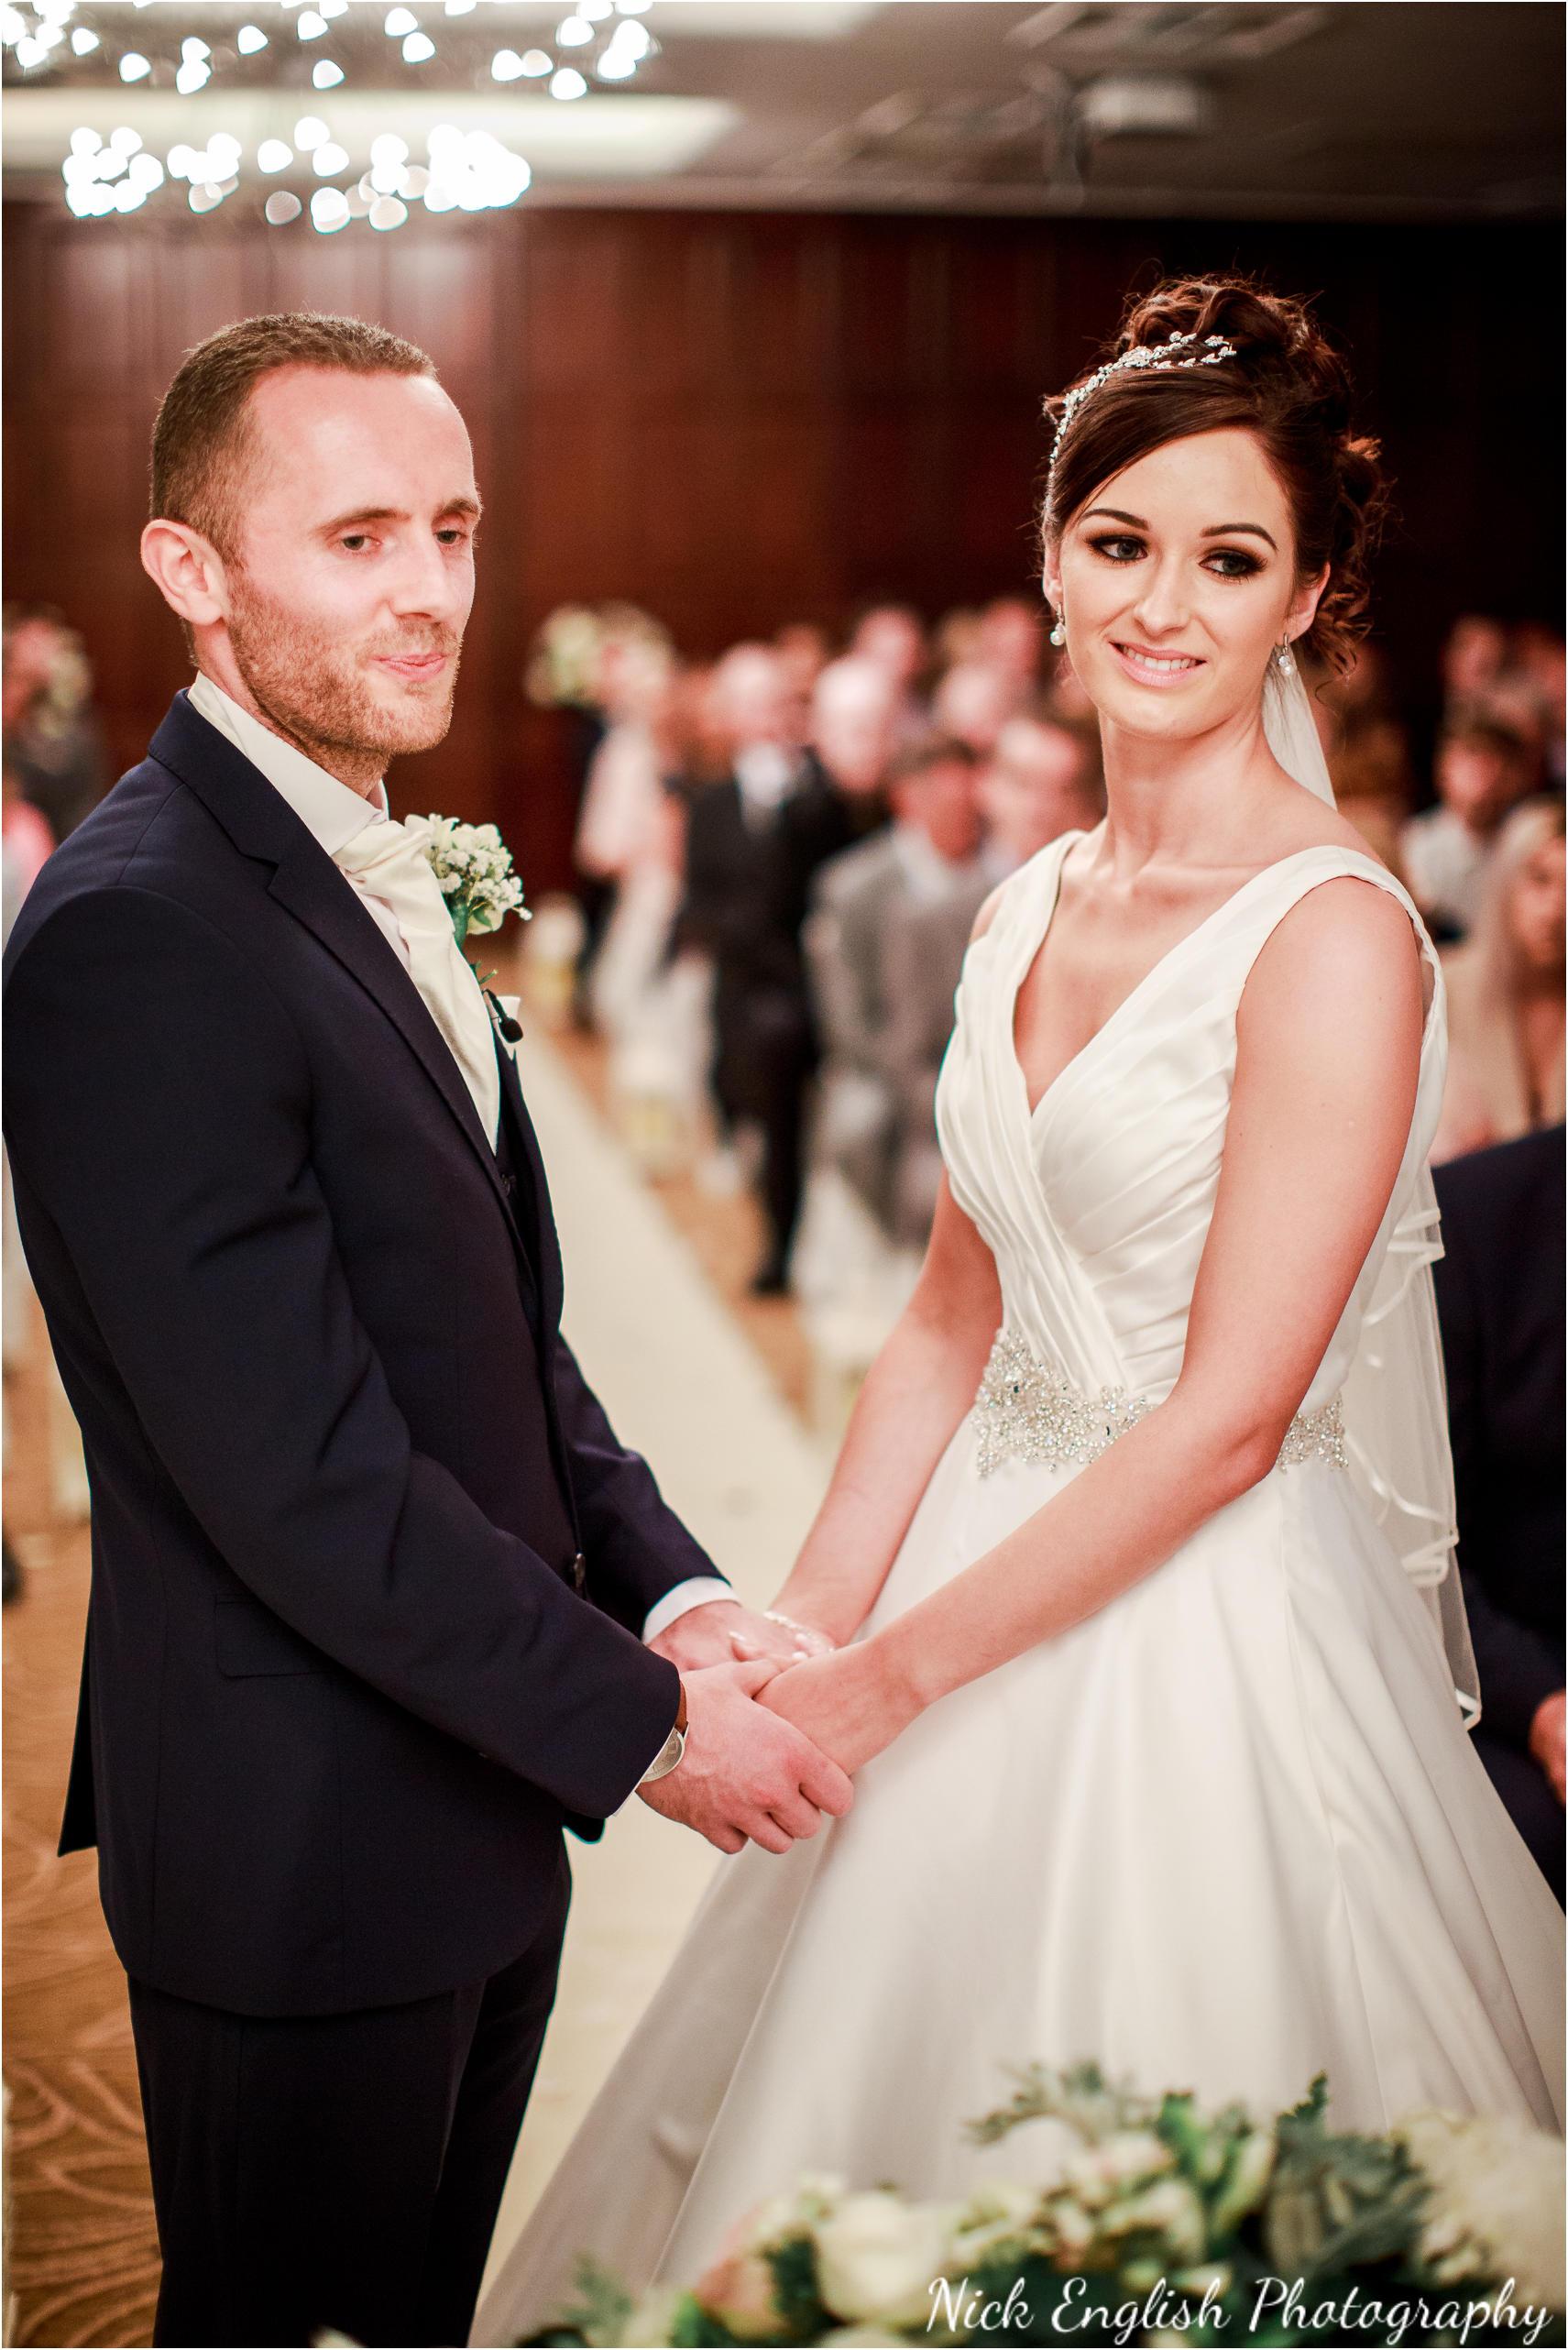 Emily David Wedding Photographs at Barton Grange Preston by Nick English Photography 61jpg.jpeg